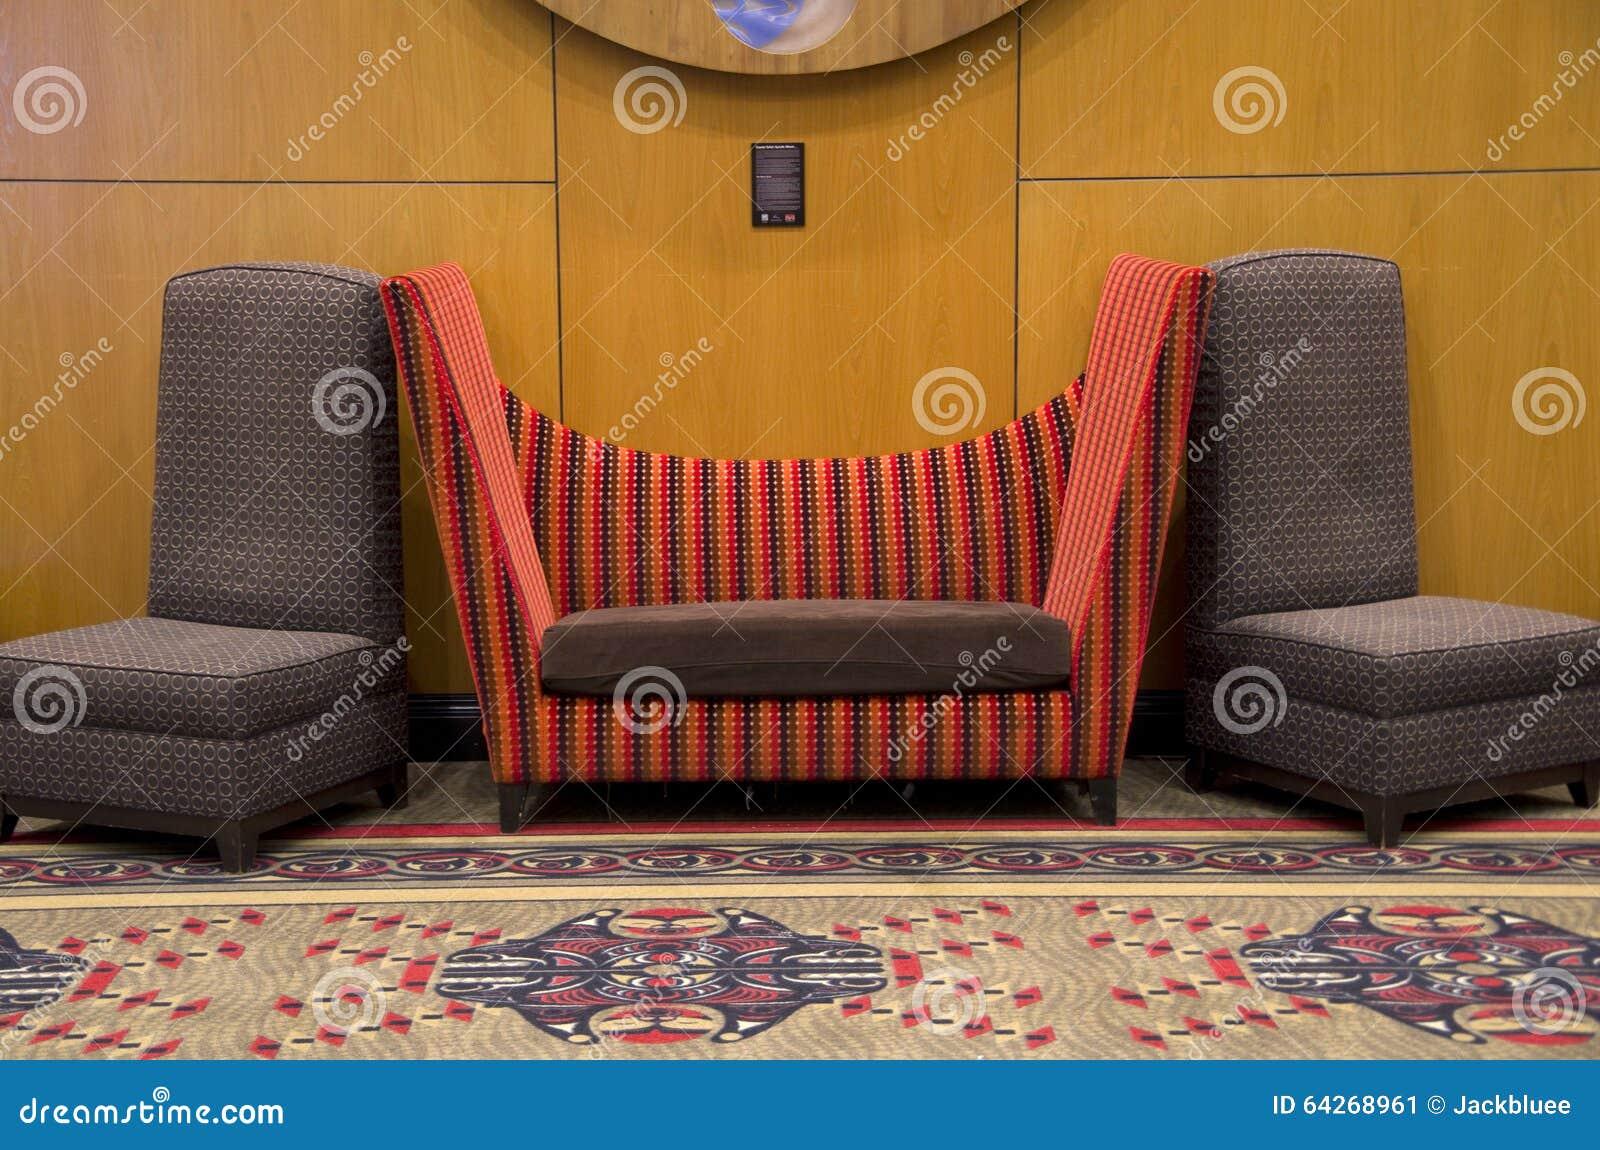 Rc Furniture Interior Design Stock Dealer ~ Unique furniture creating stylish atmosphere of the